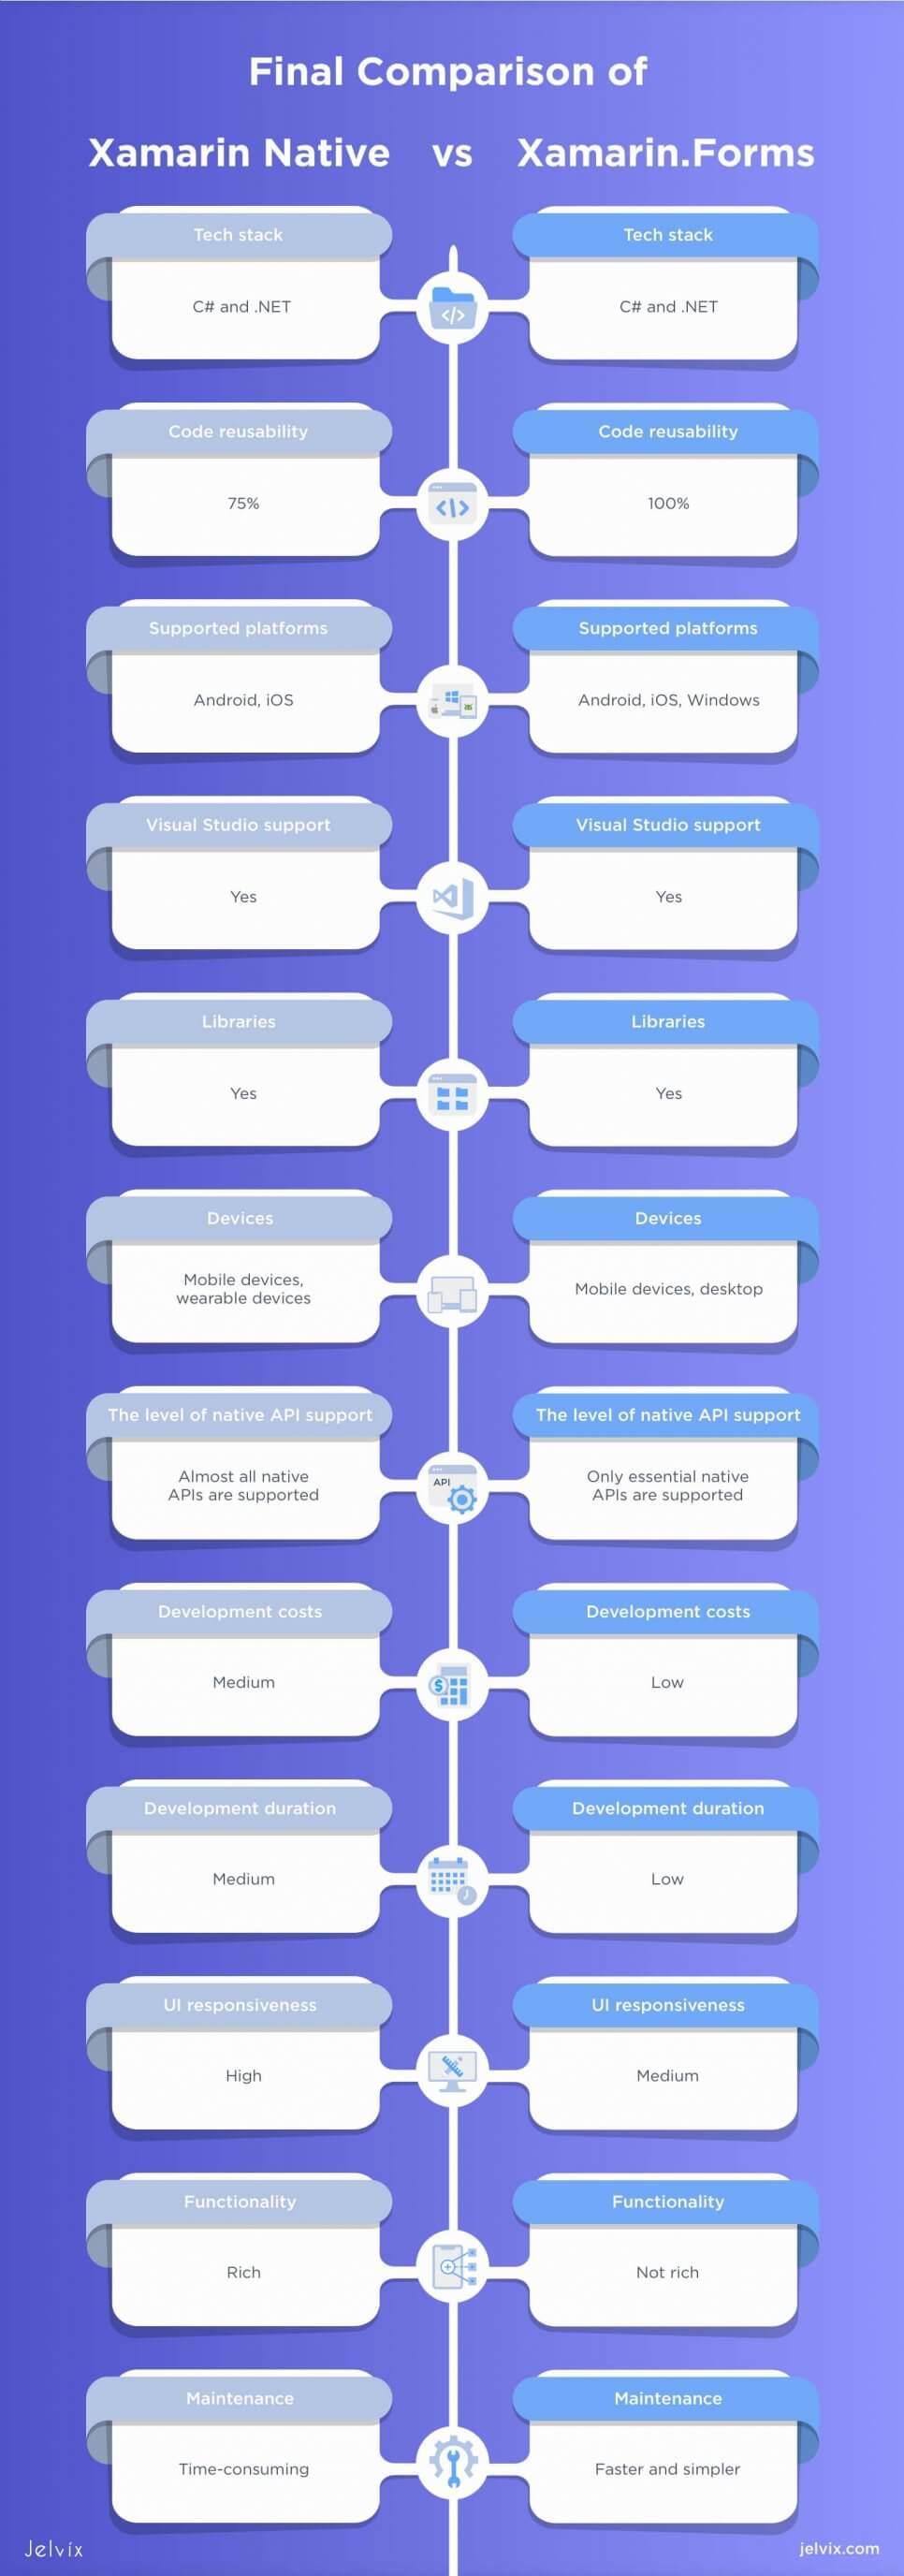 Xamarin vs Xamarin.Forms infographic